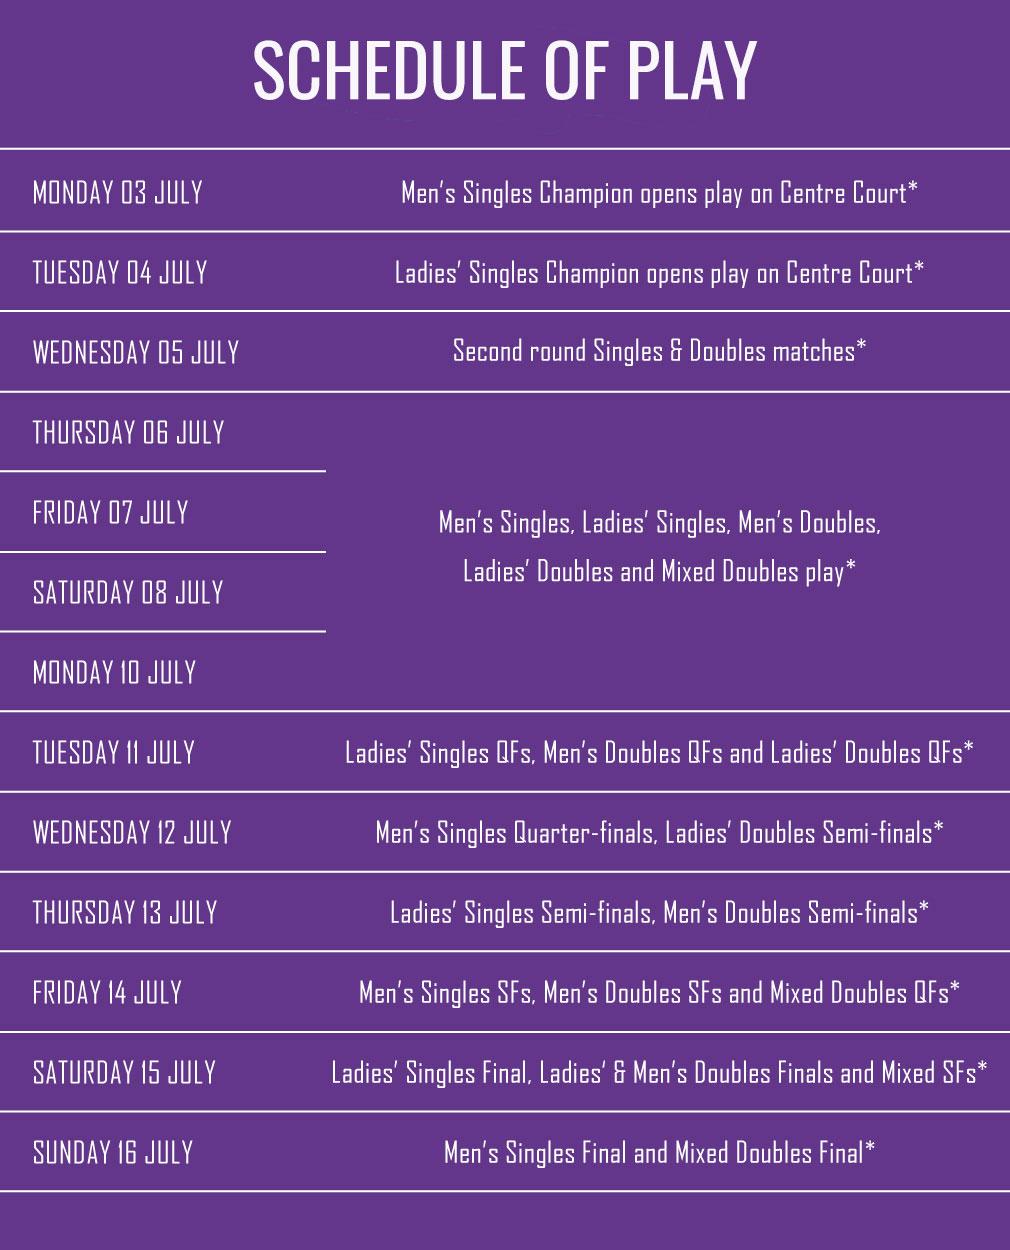 Cómo mirar las finales de Wimbledon en línea | Qué Es Wimbledon | Le VPN